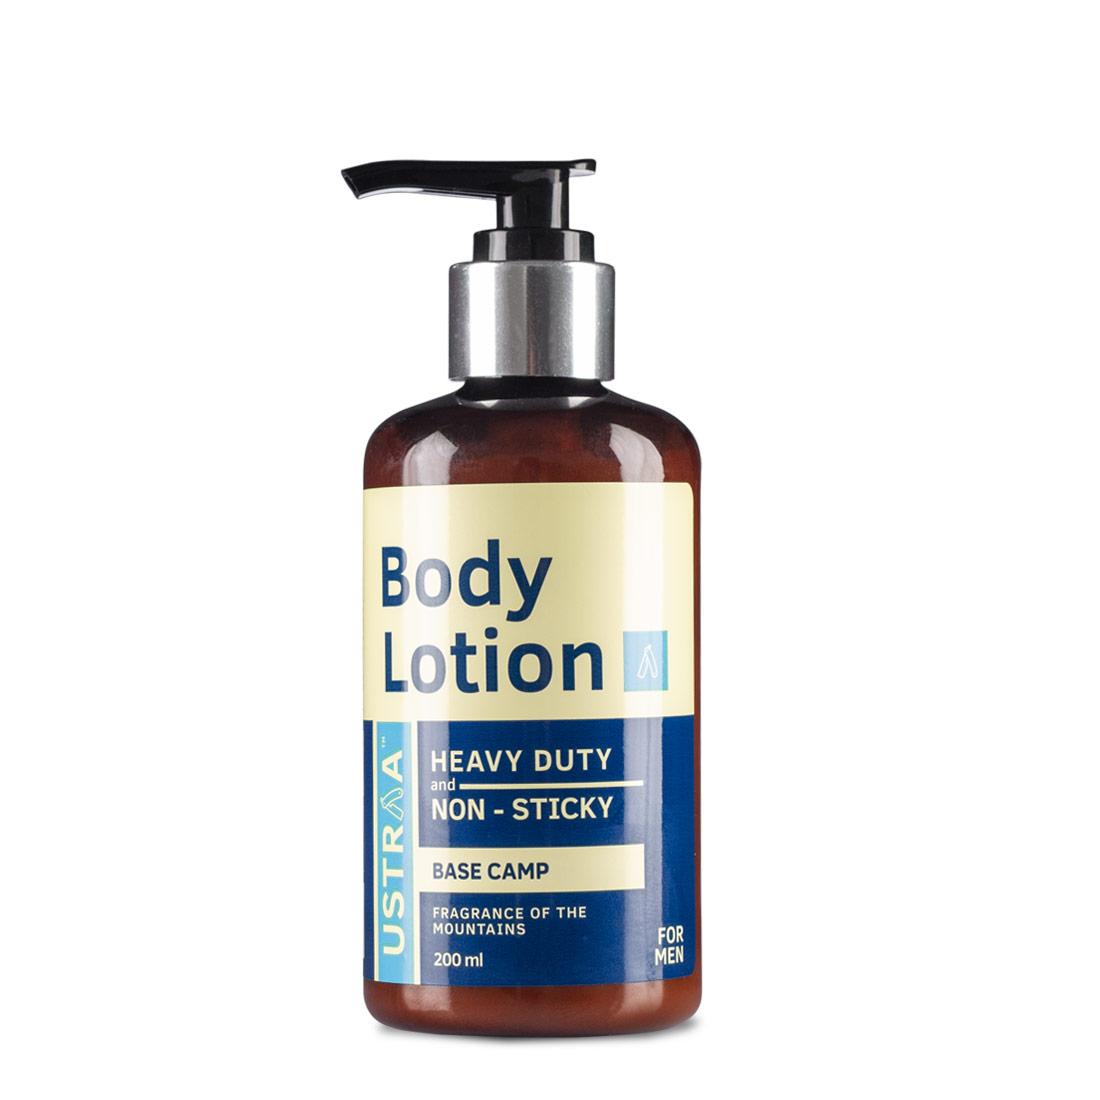 Ustraa | Body Lotion - Base Camp - 200ml